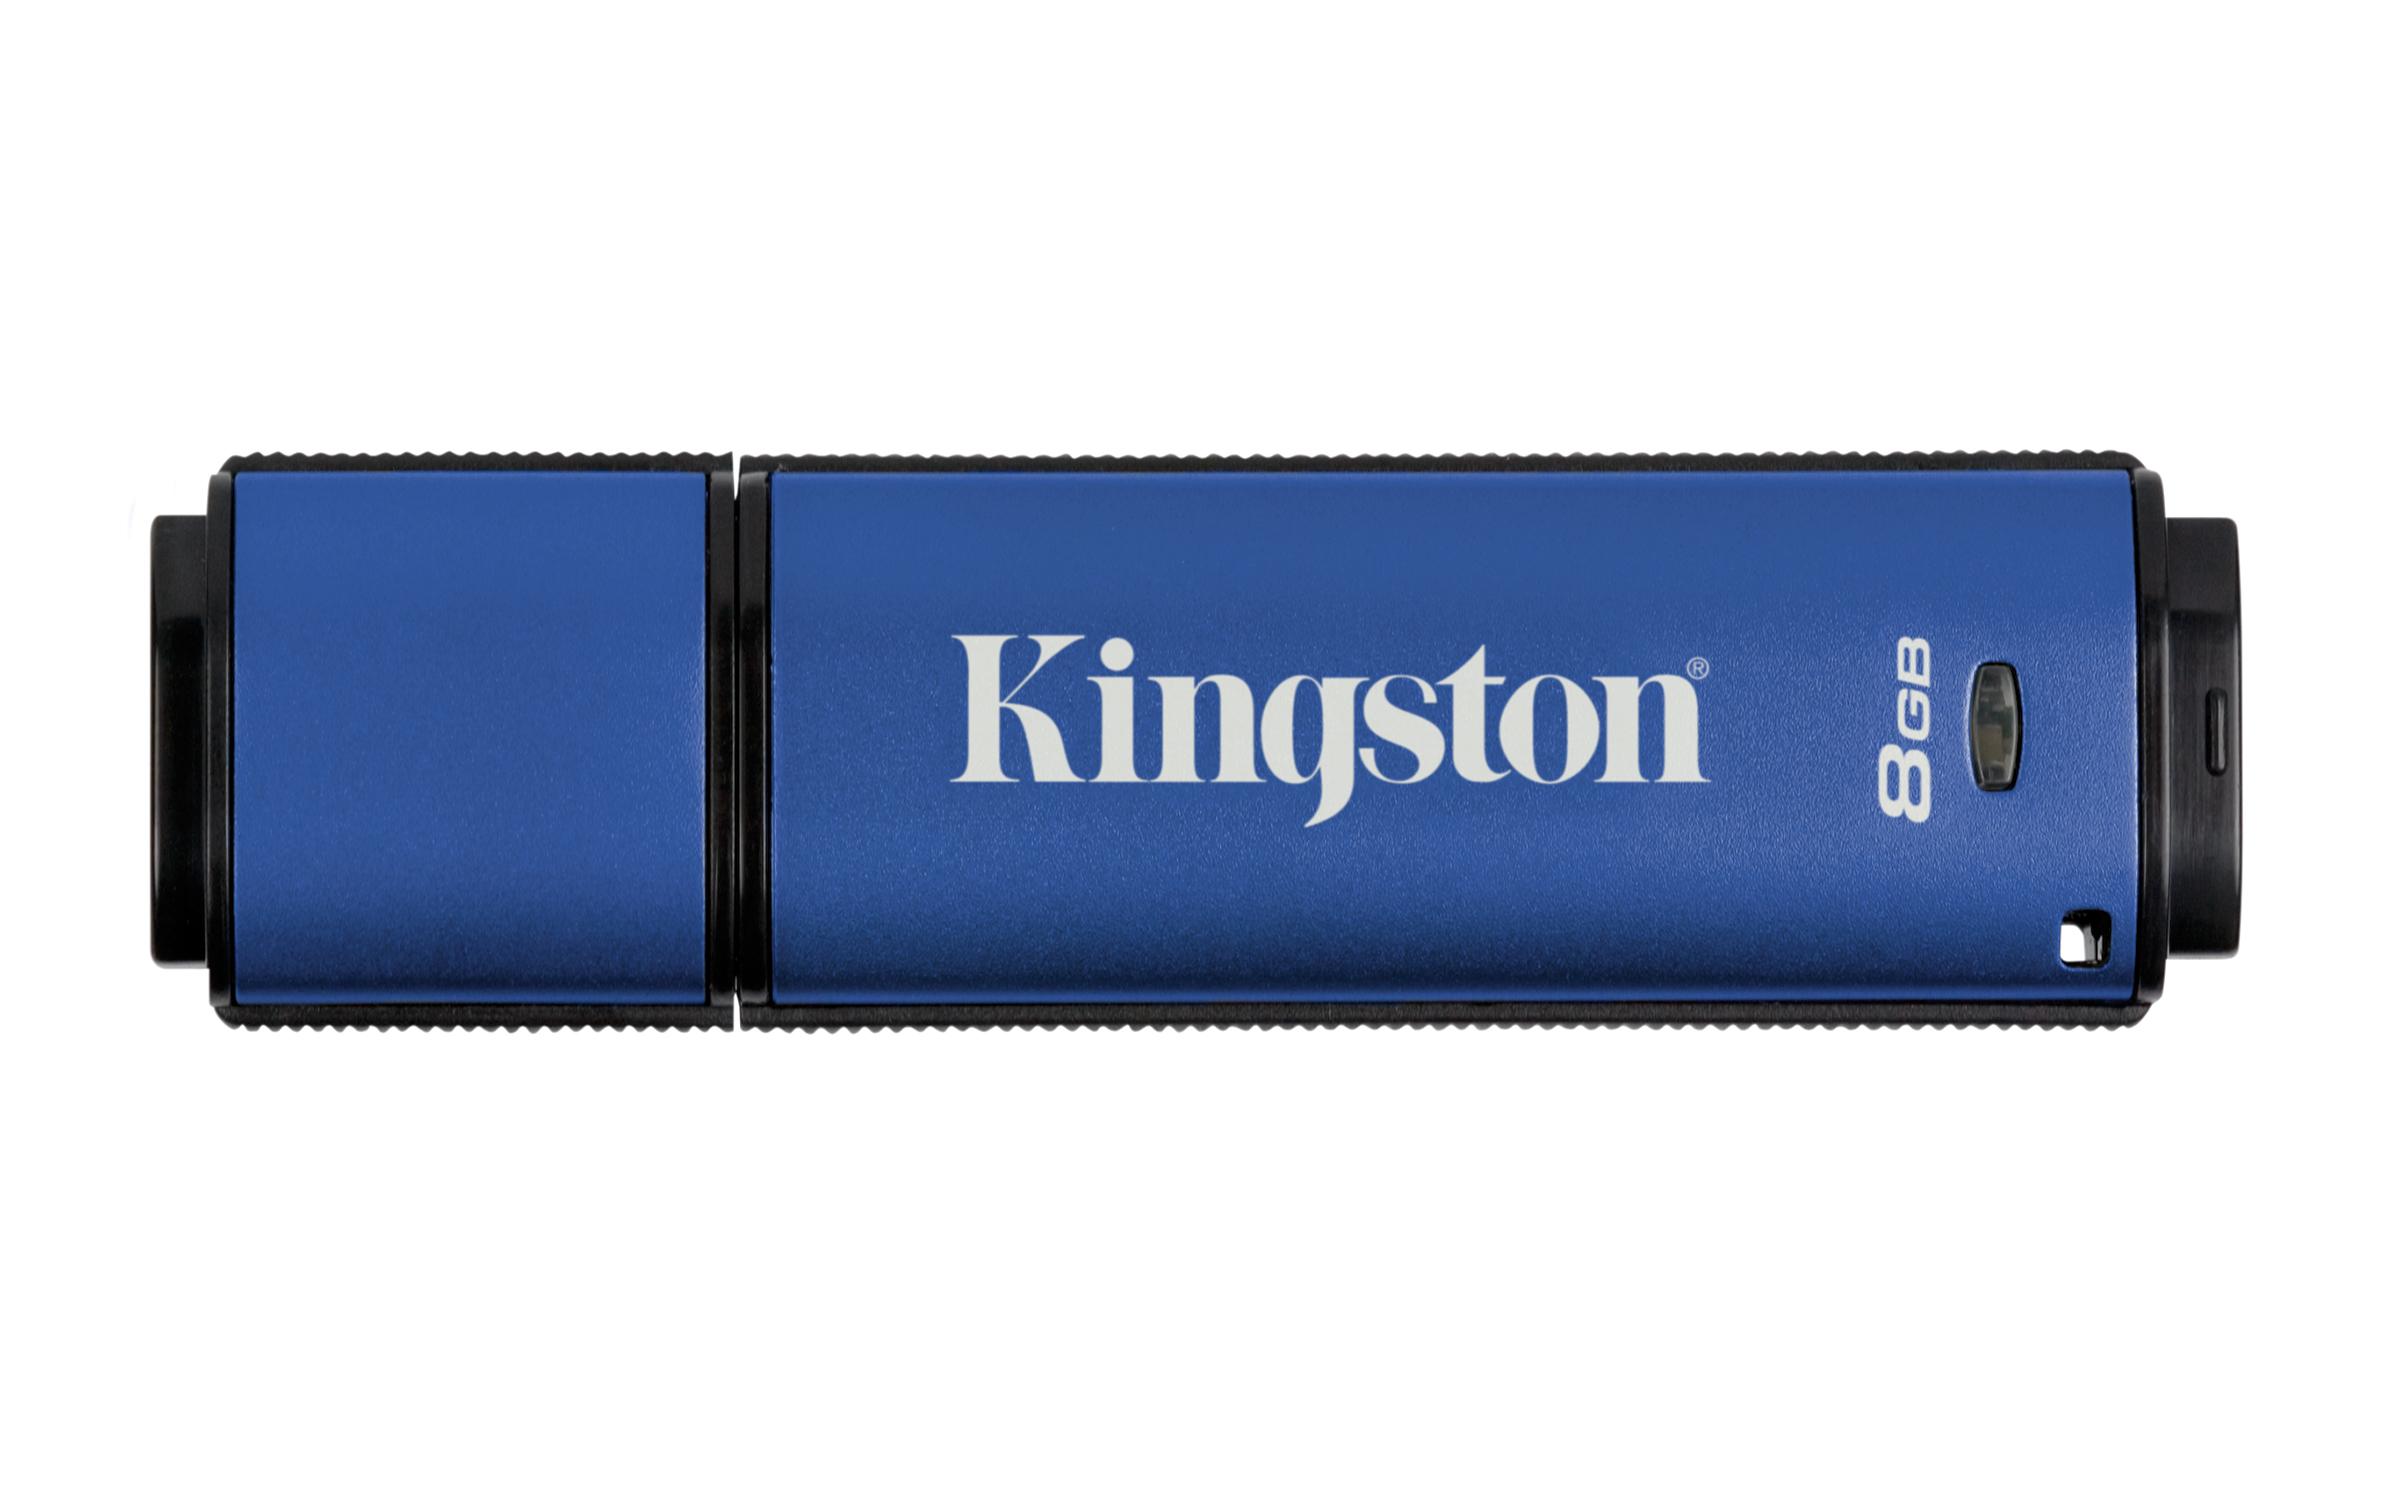 DTVP30 USB-Stick 8 GB (256-bit AES Encrypted, USB 3.0)